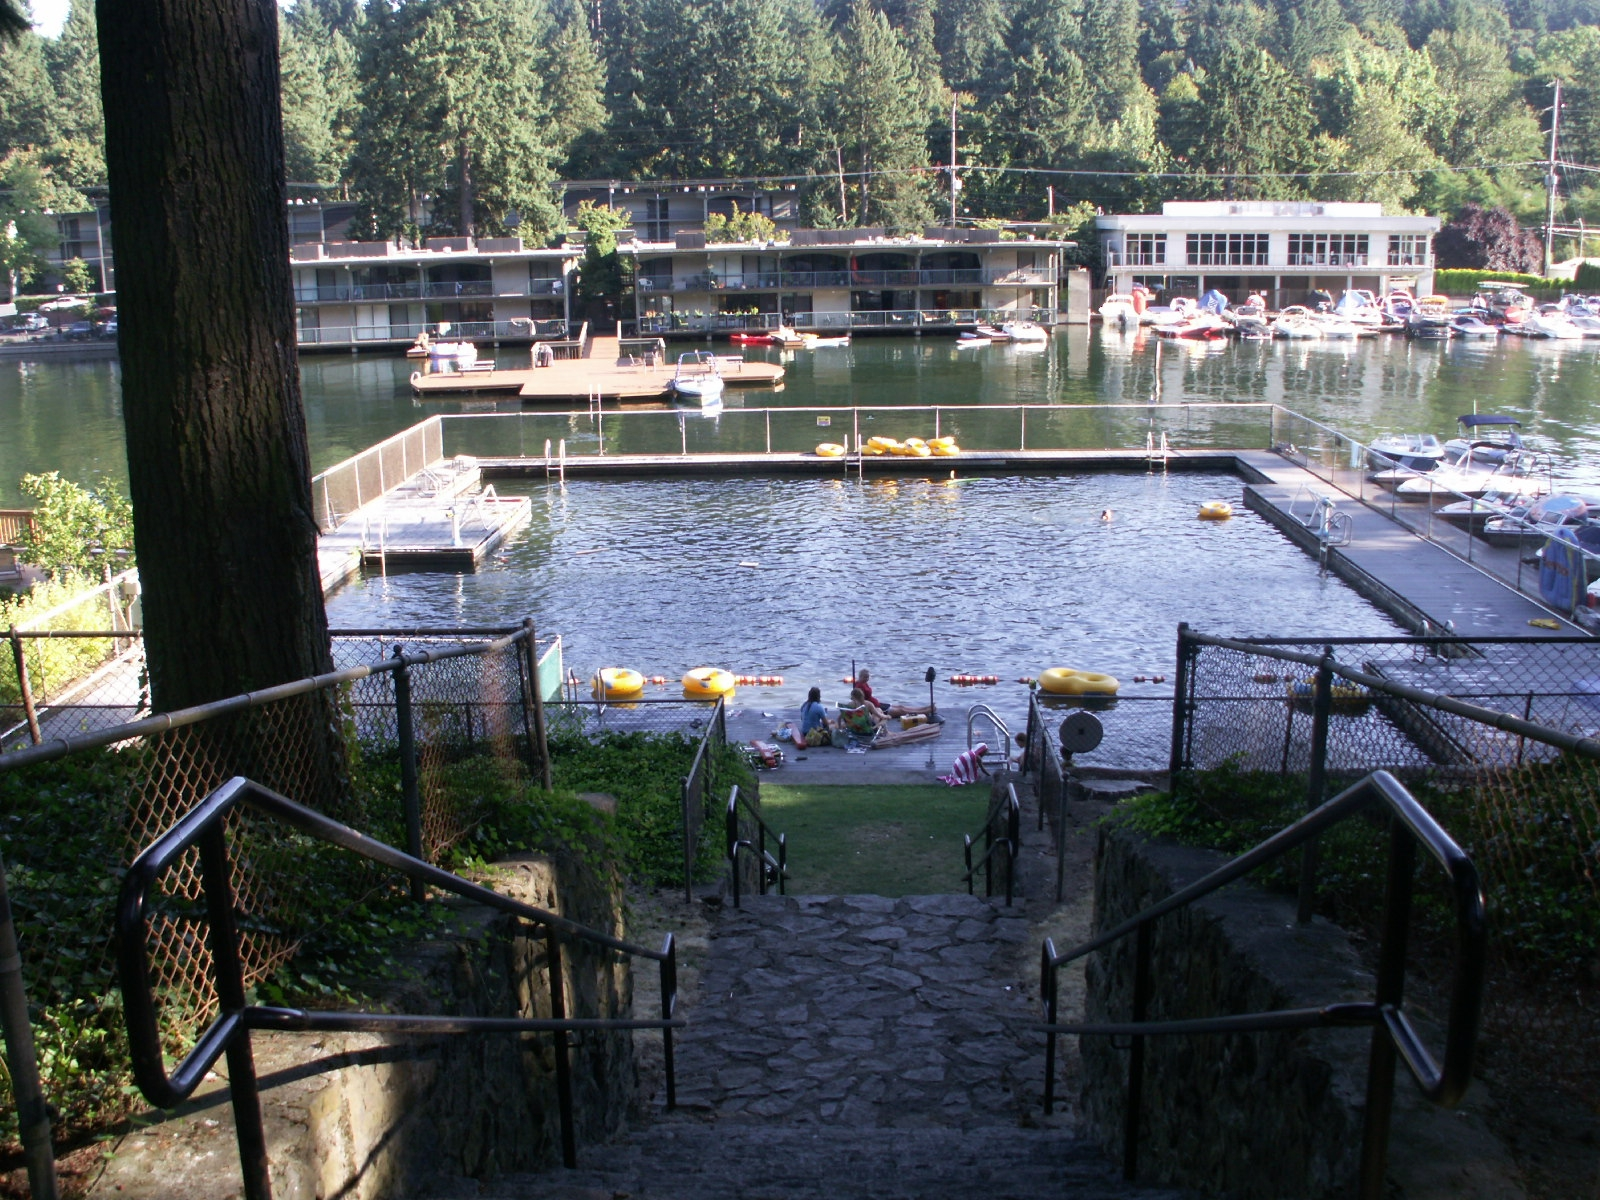 52 Reasons To Love Lake Oswego